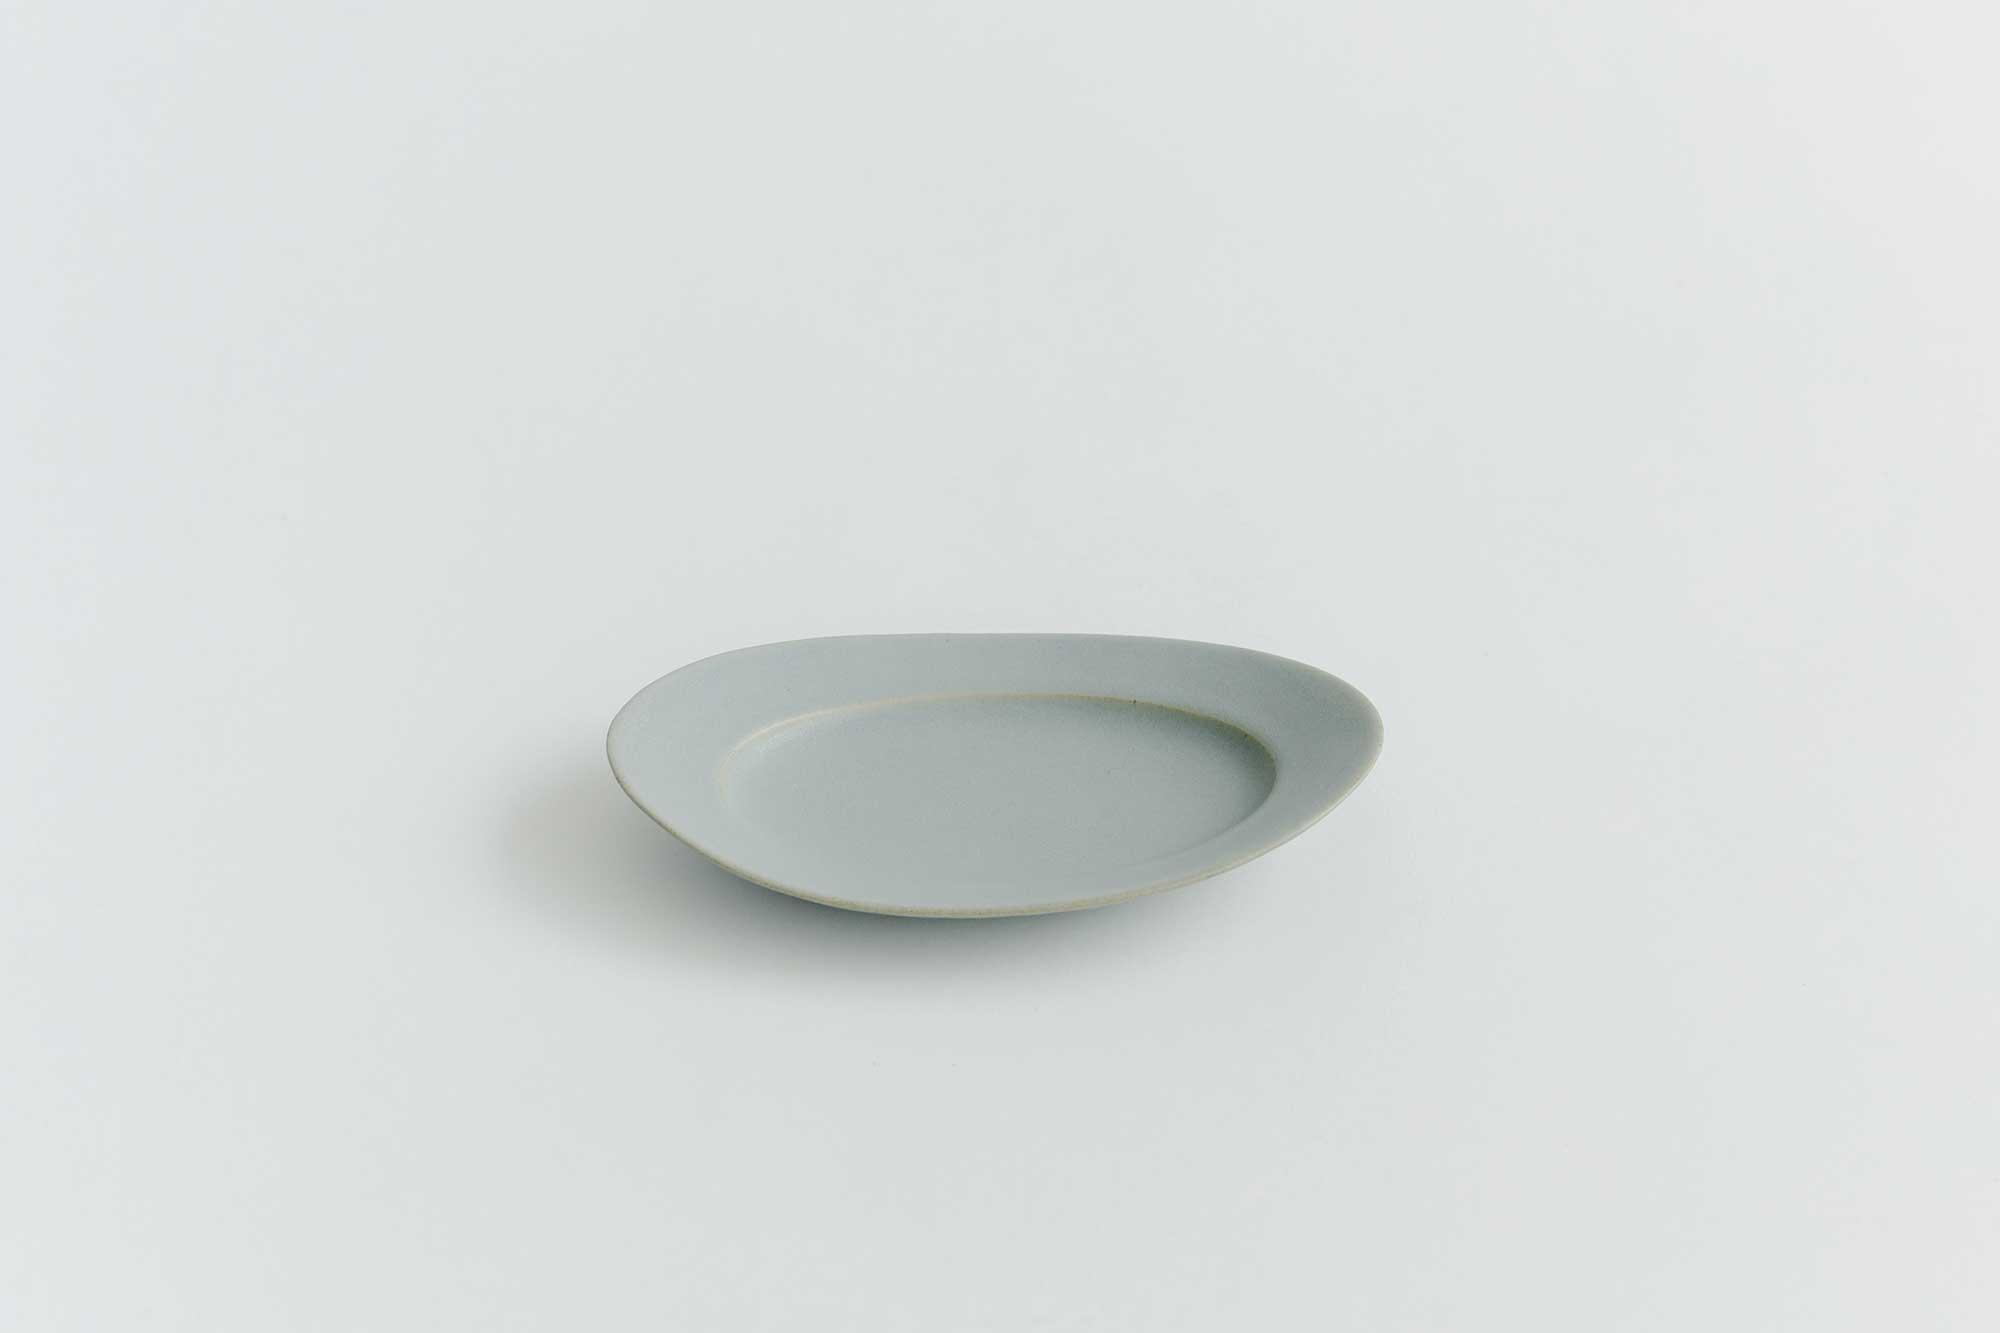 Awabi ware オーバル皿 S